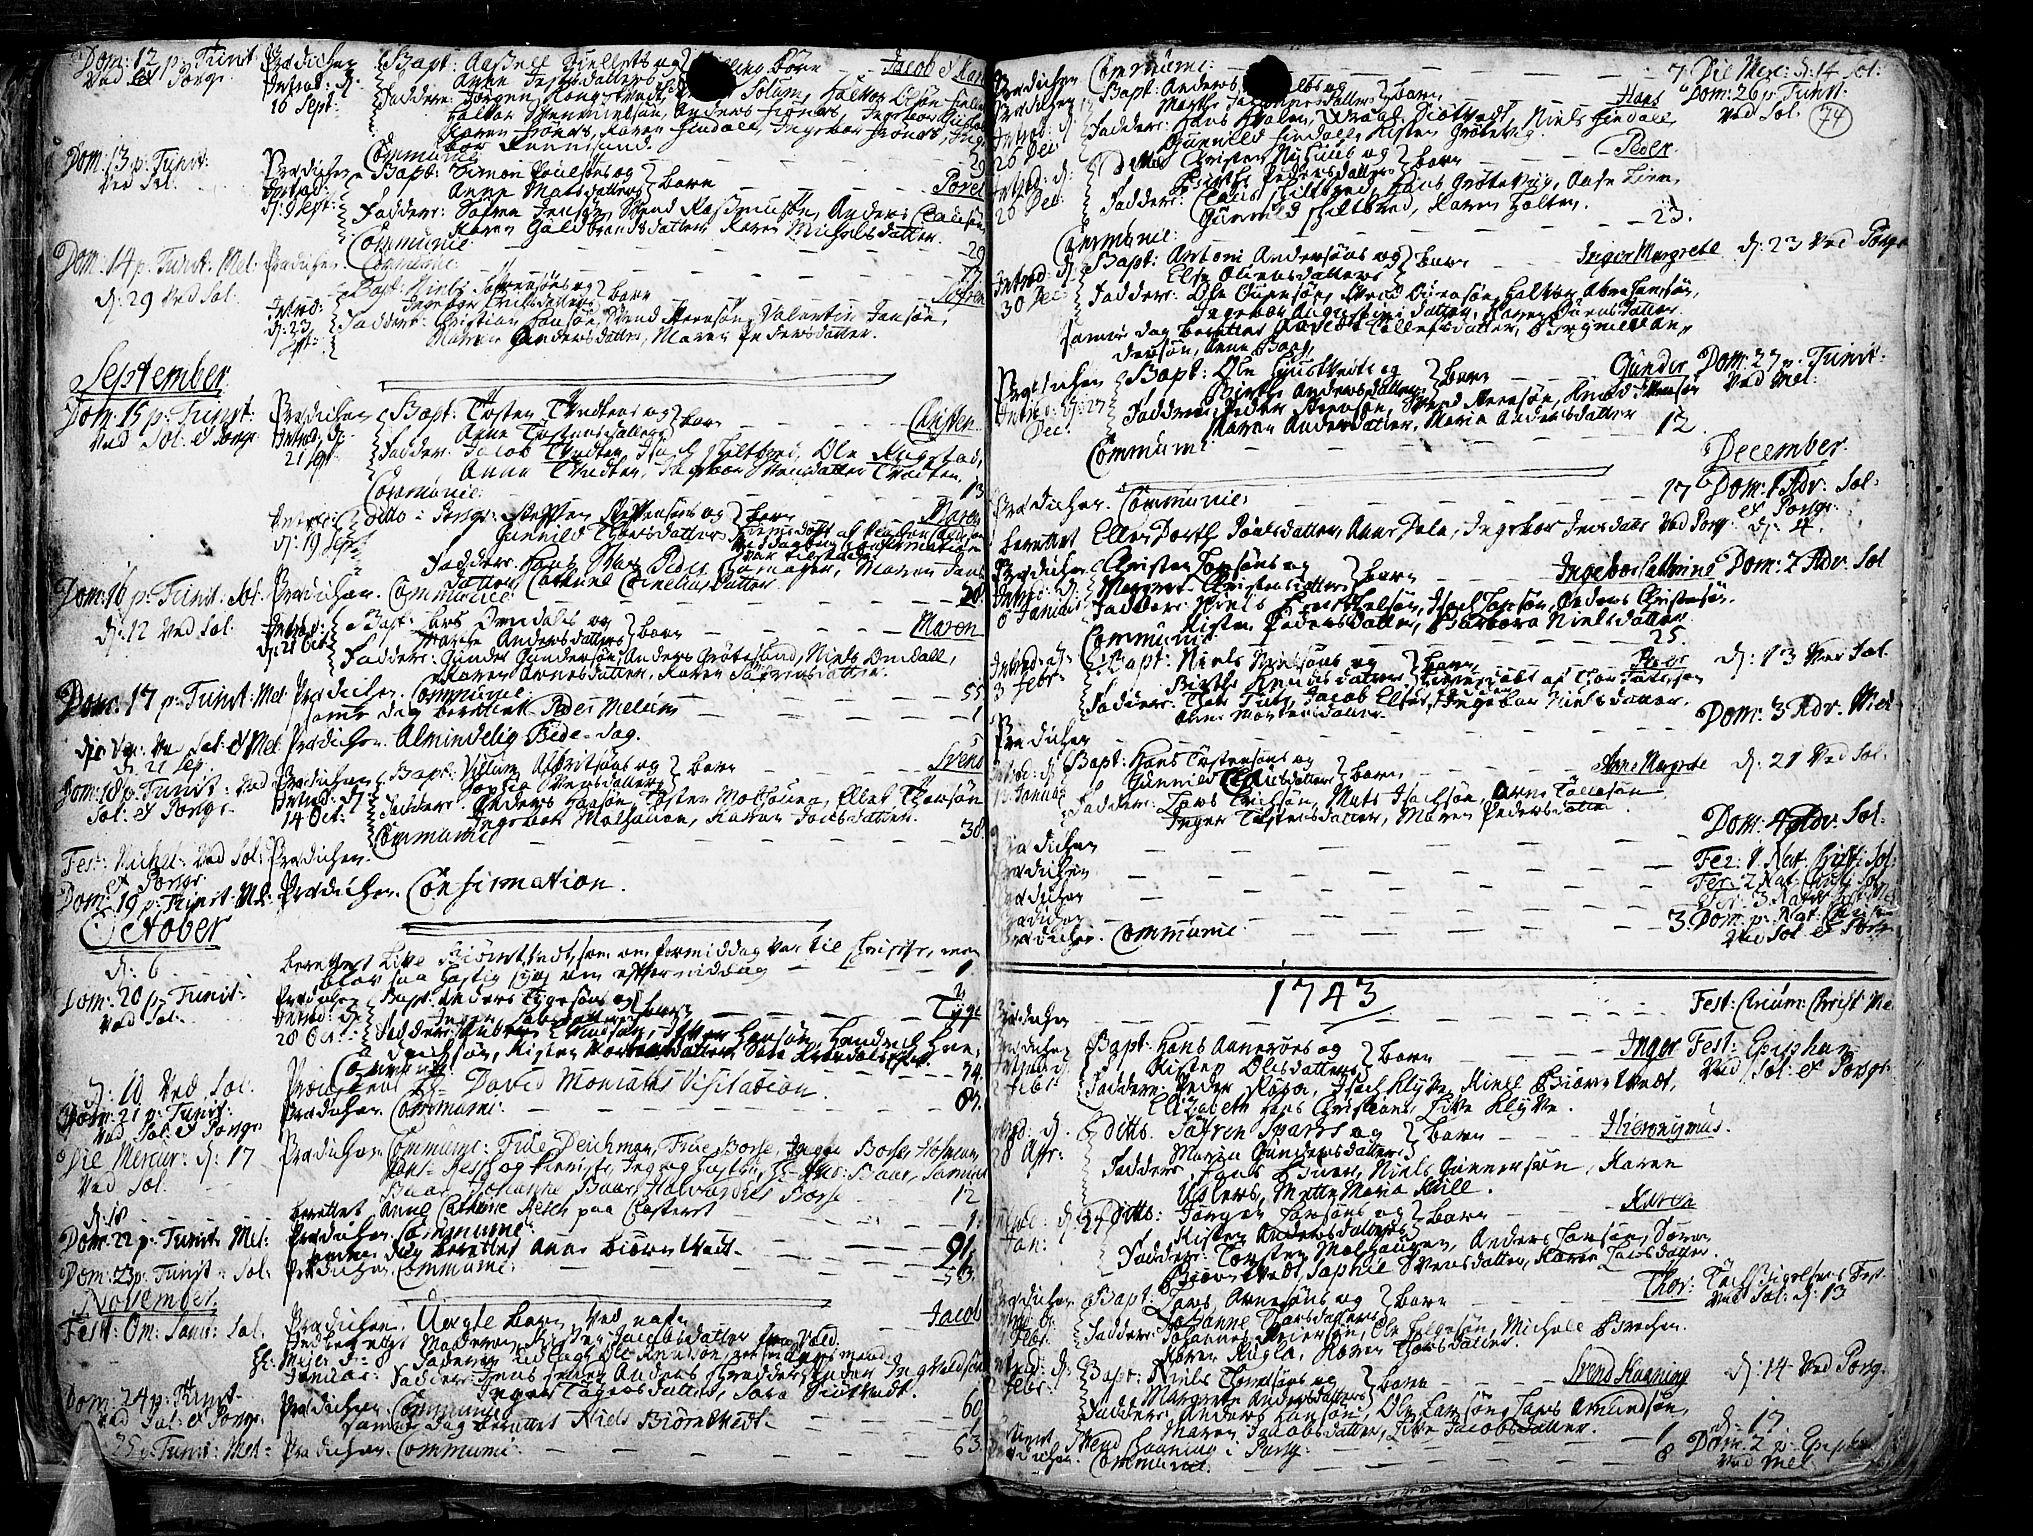 SAKO, Solum kirkebøker, F/Fa/L0002: Ministerialbok nr. I 2, 1713-1761, s. 74